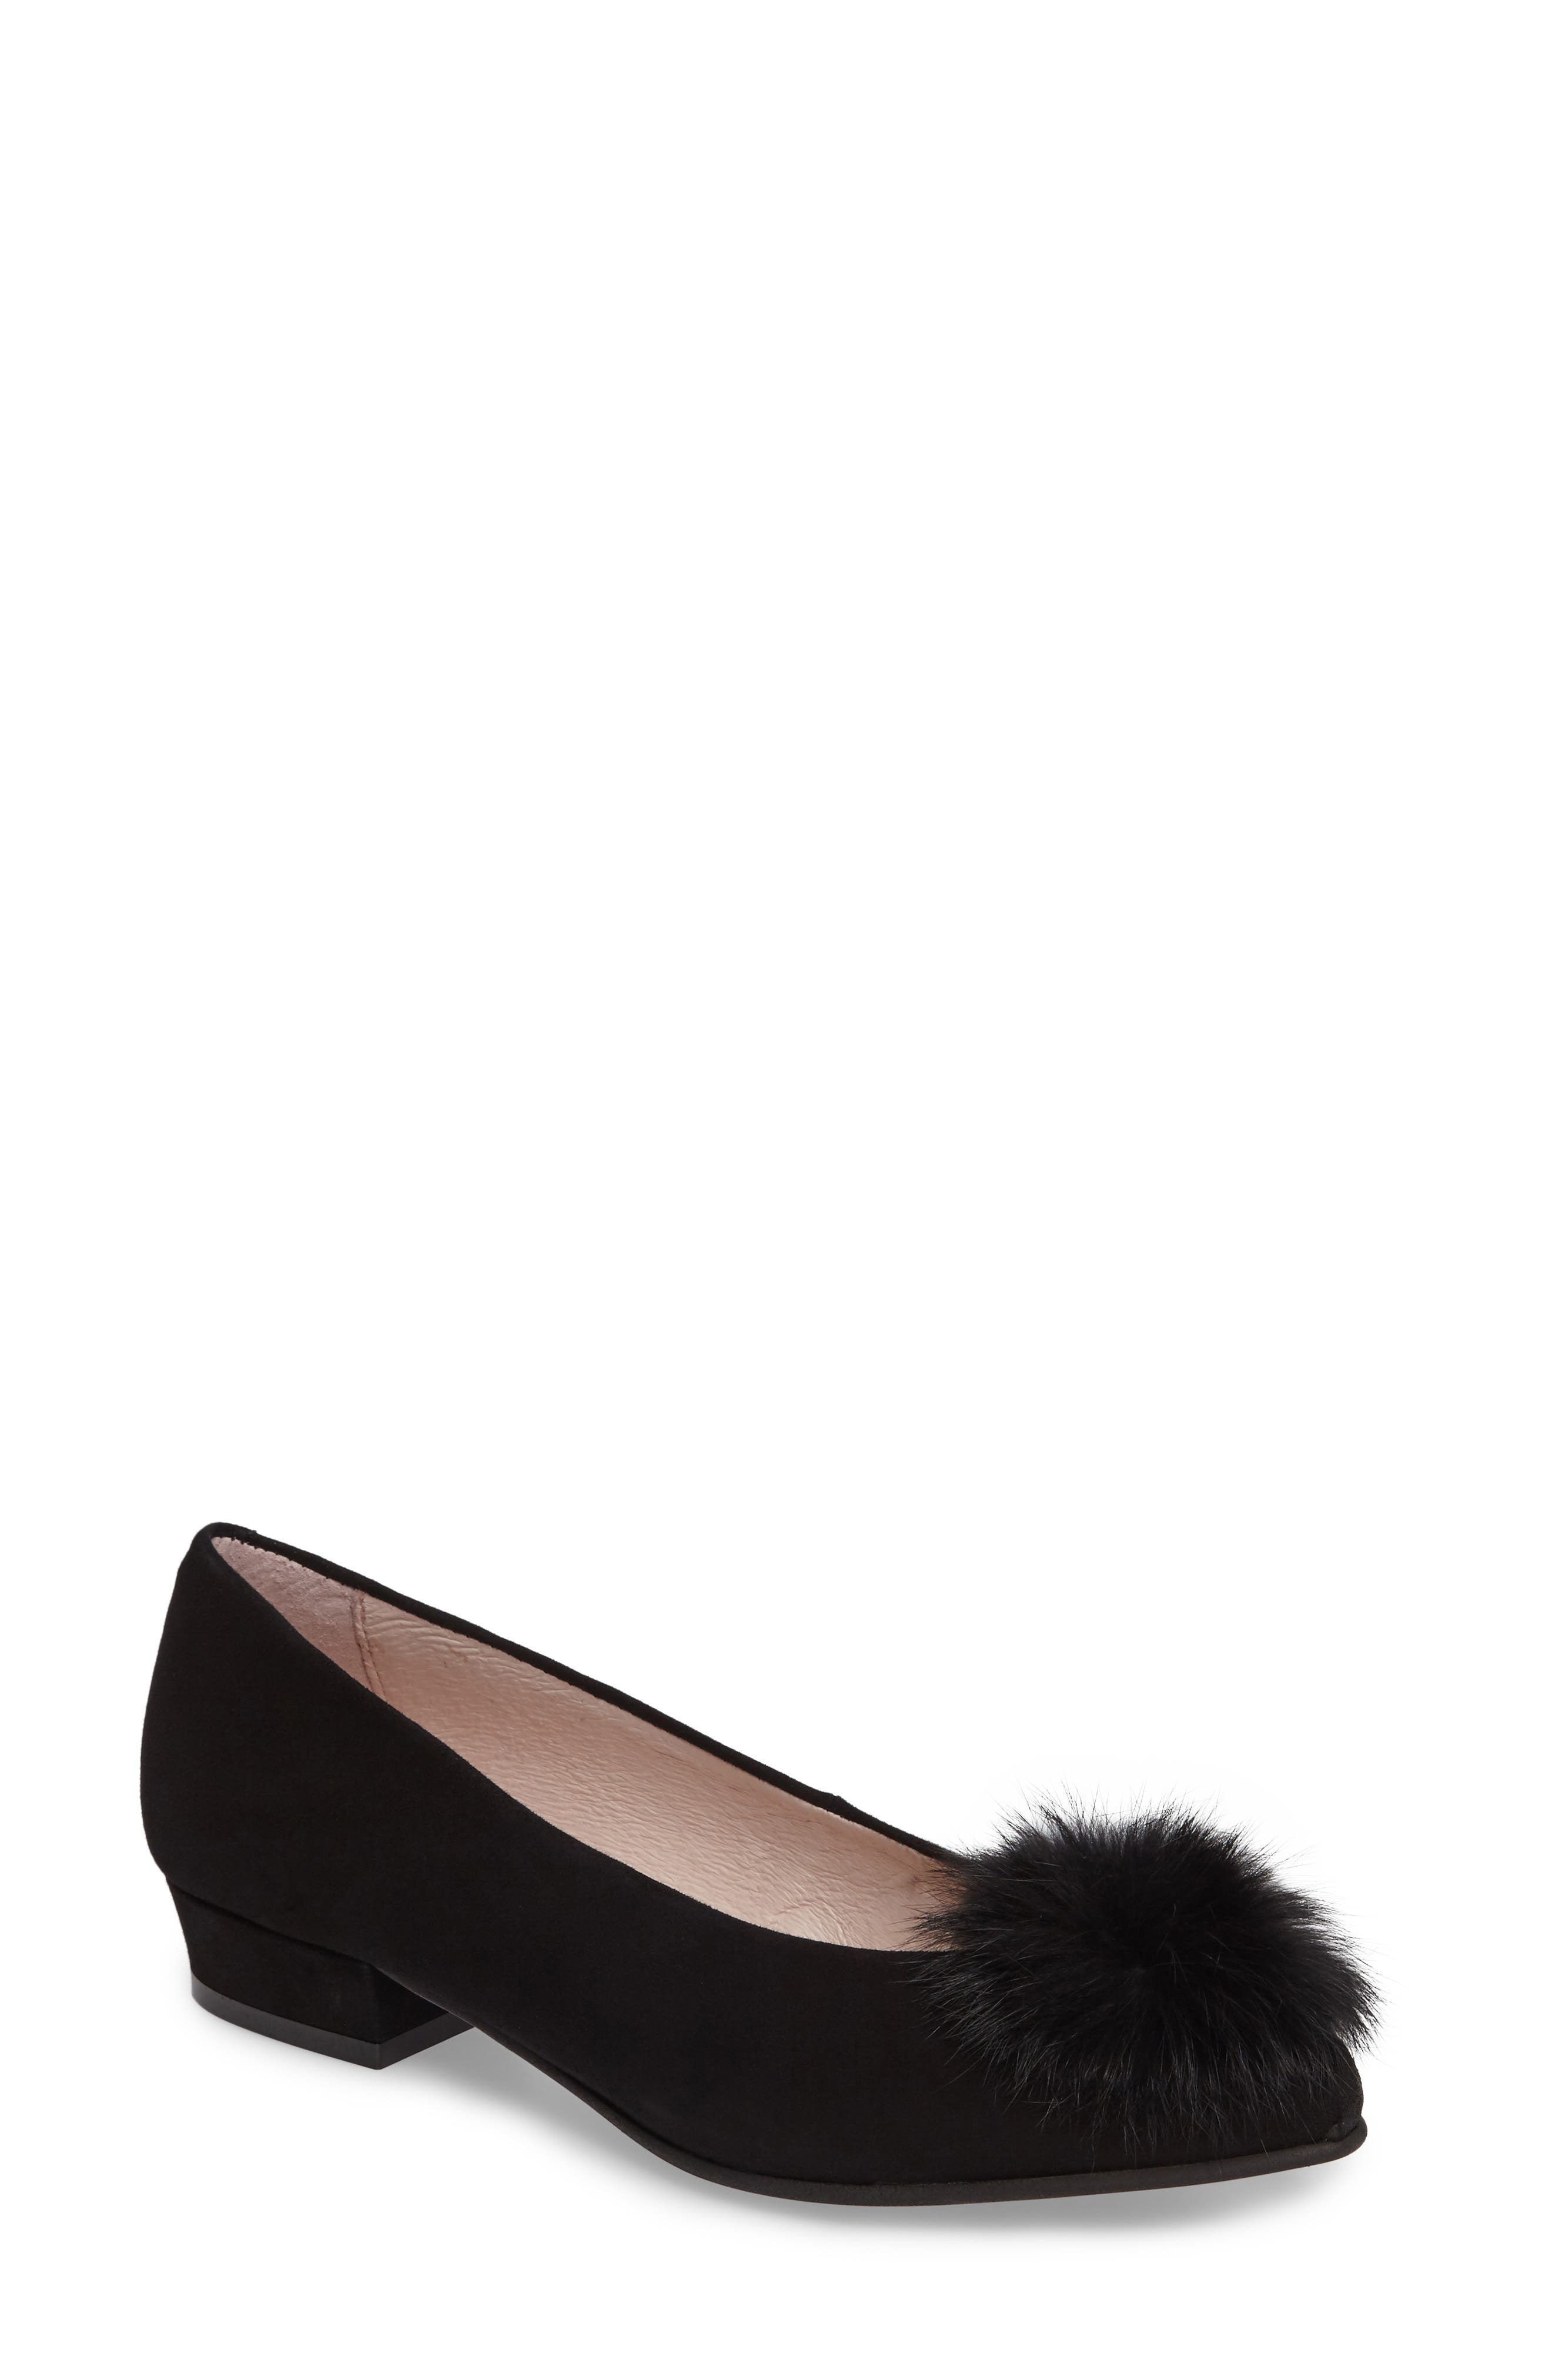 Sandy Flat with Genuine Rabbit Fur Pom,                             Main thumbnail 1, color,                             001